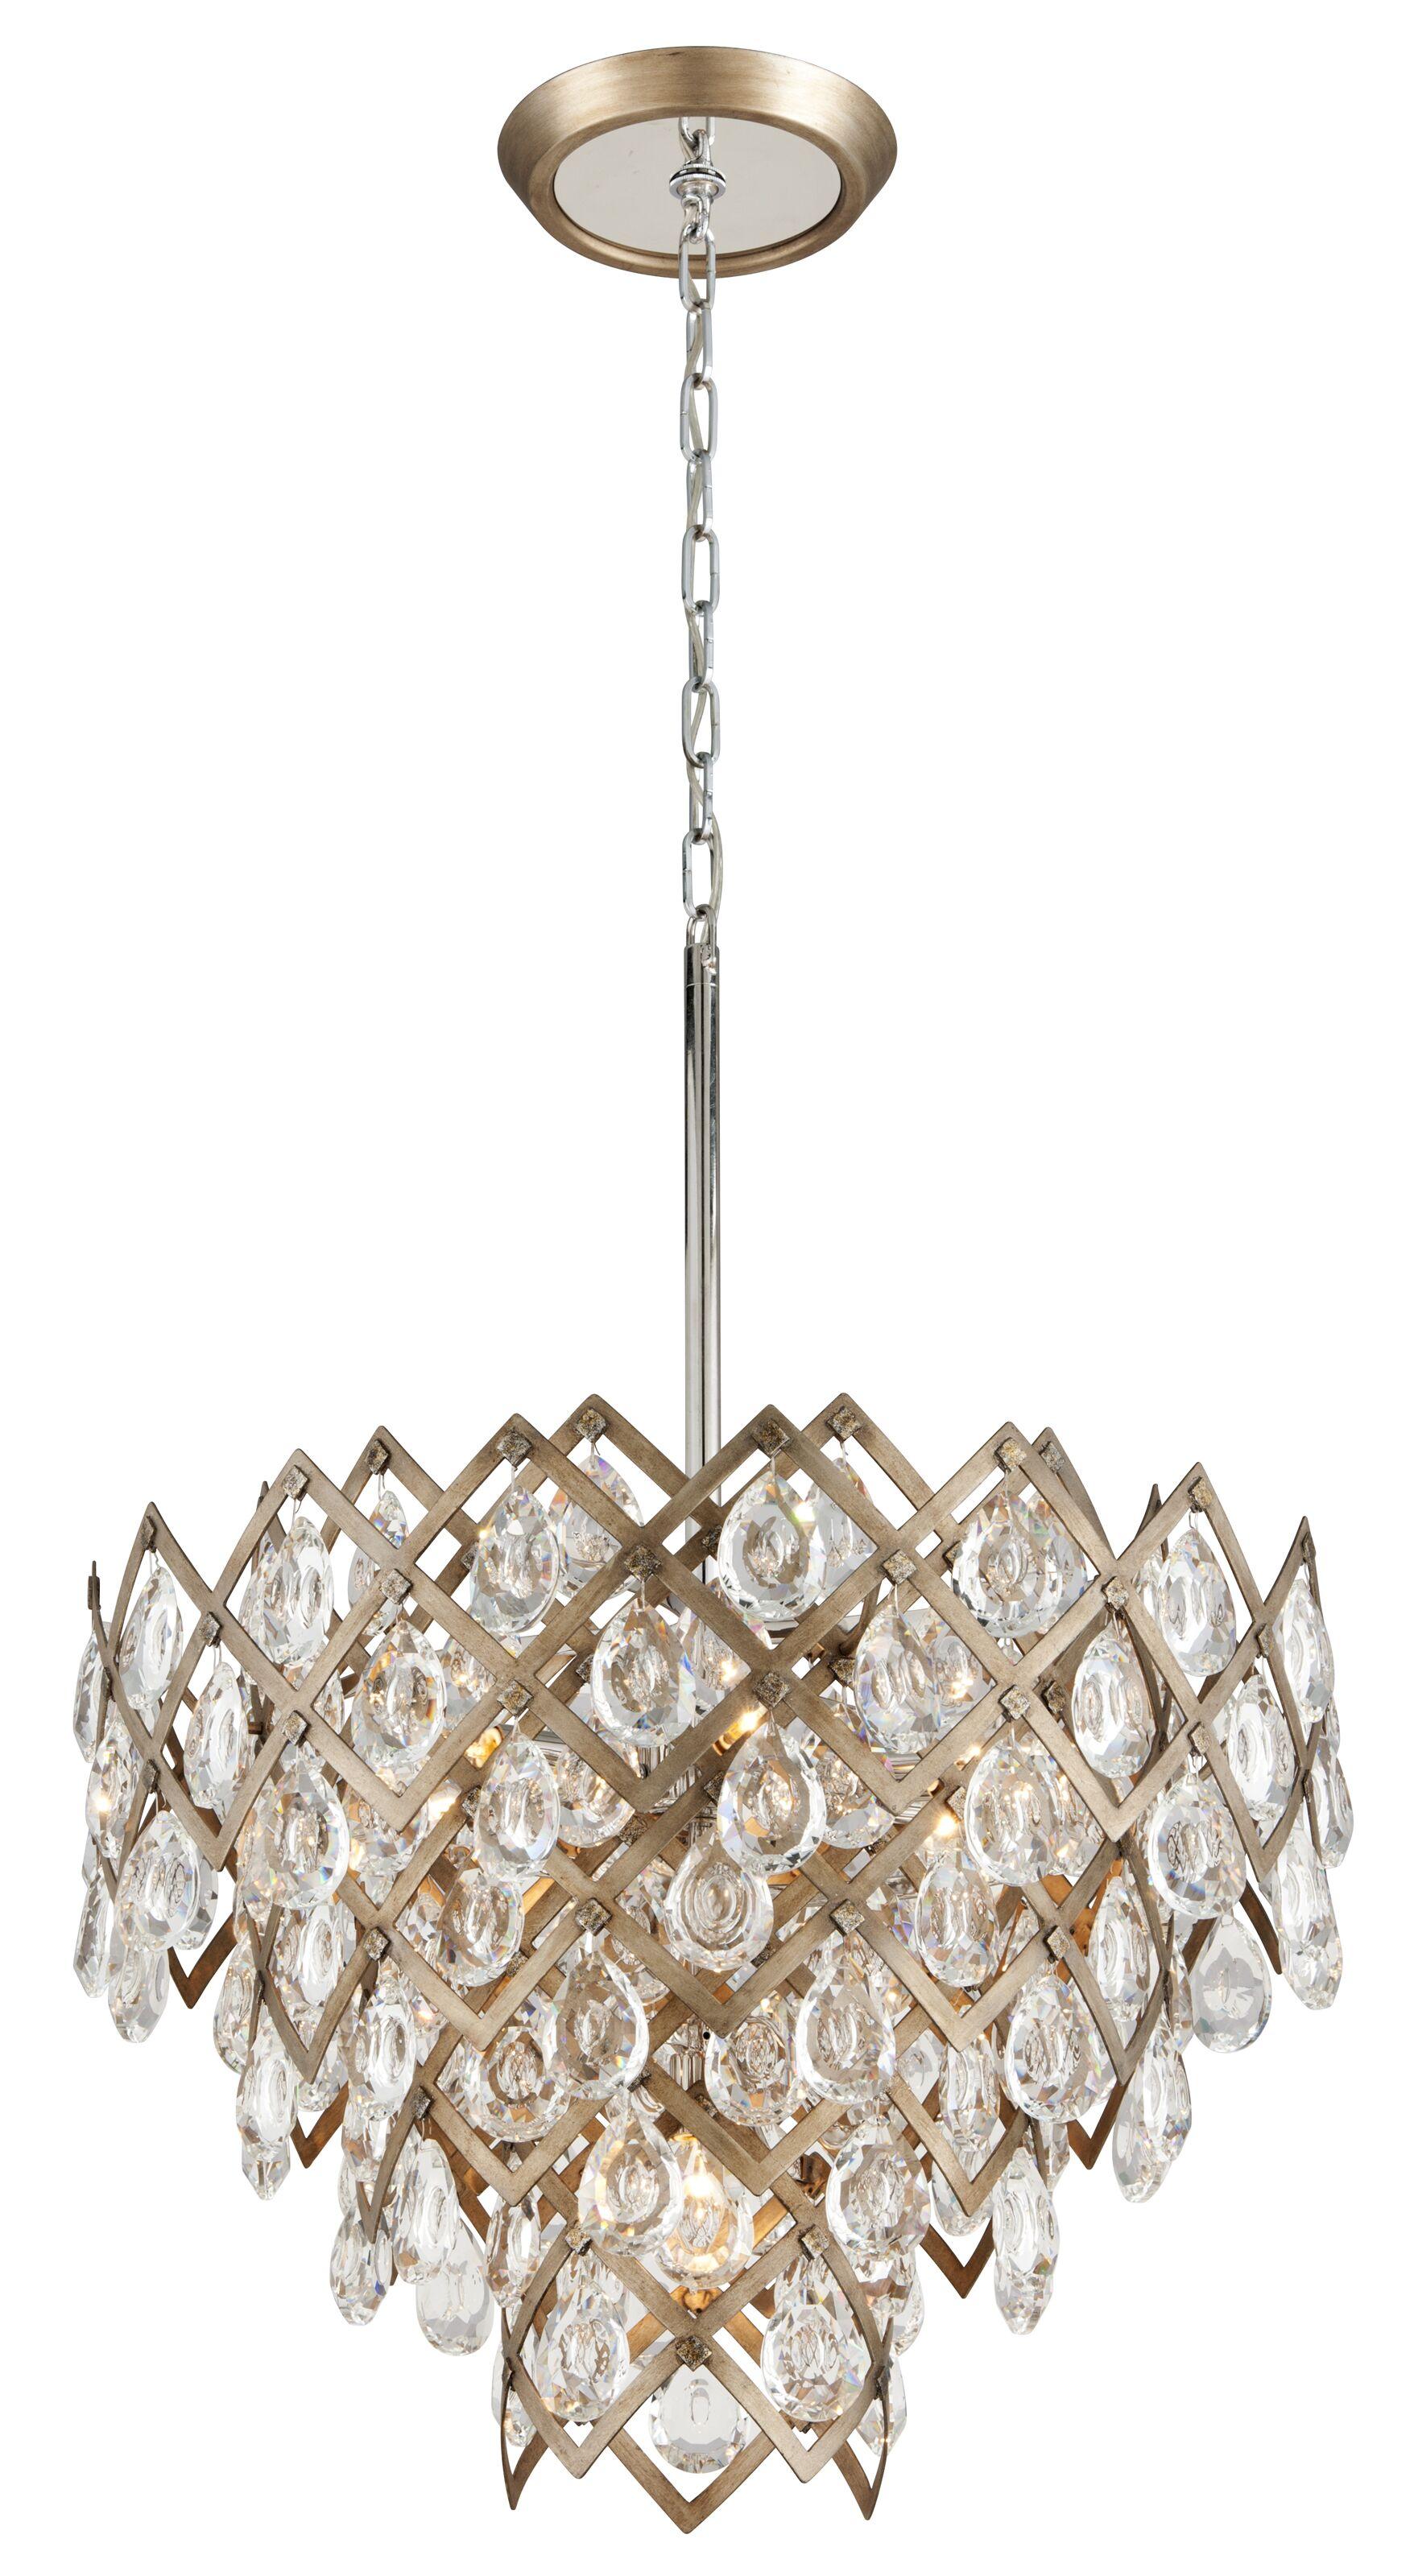 Tiara 7-Light Crystal Chandelier